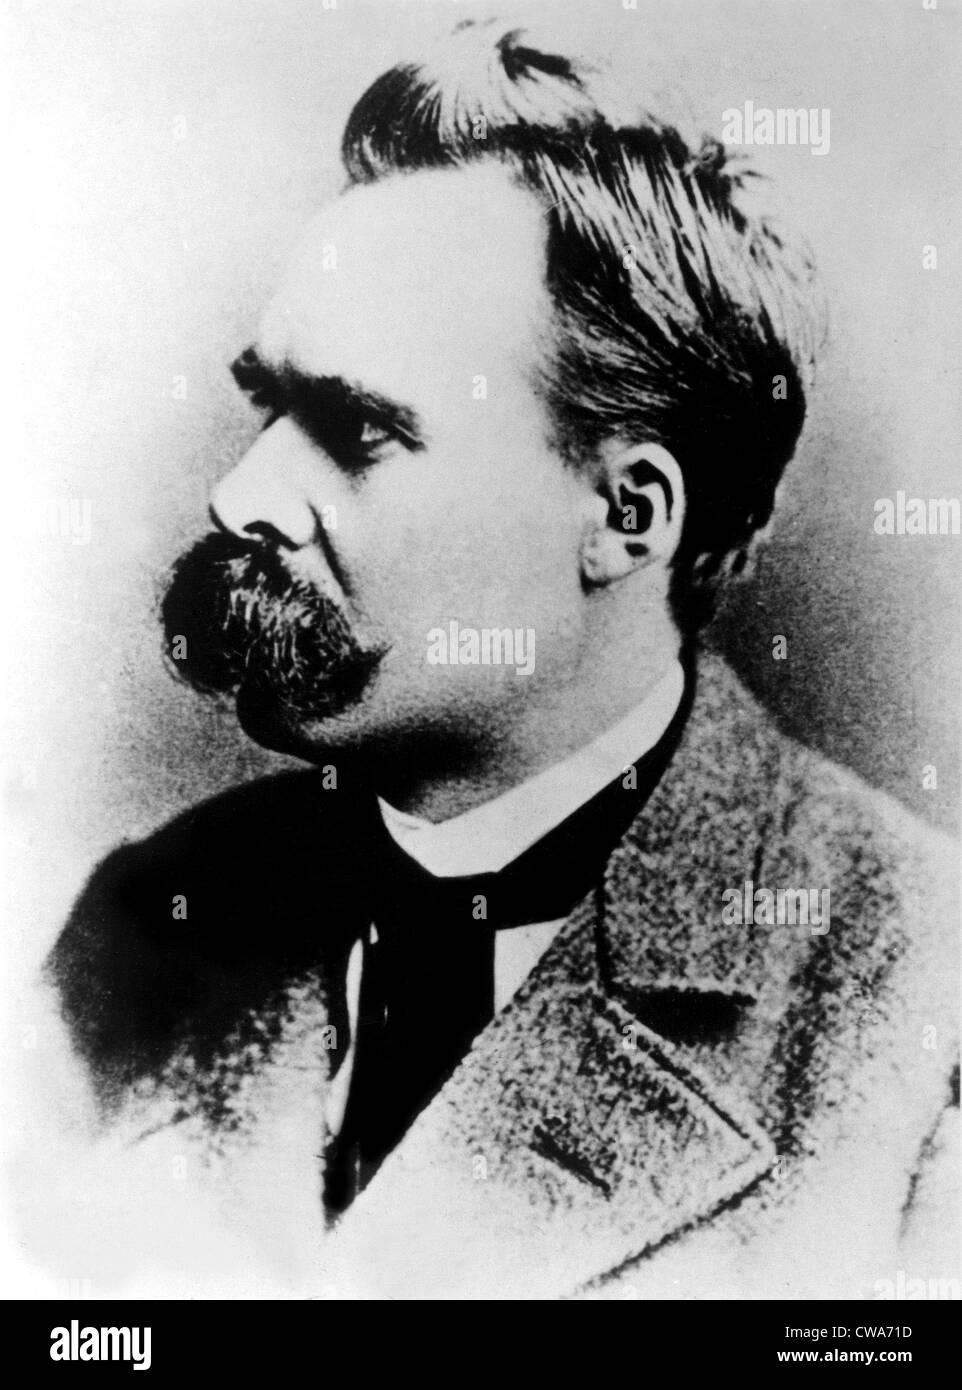 Friedrich Nietzsche, filósofo alemán del siglo XIX, circa 1887. Imagen De Stock